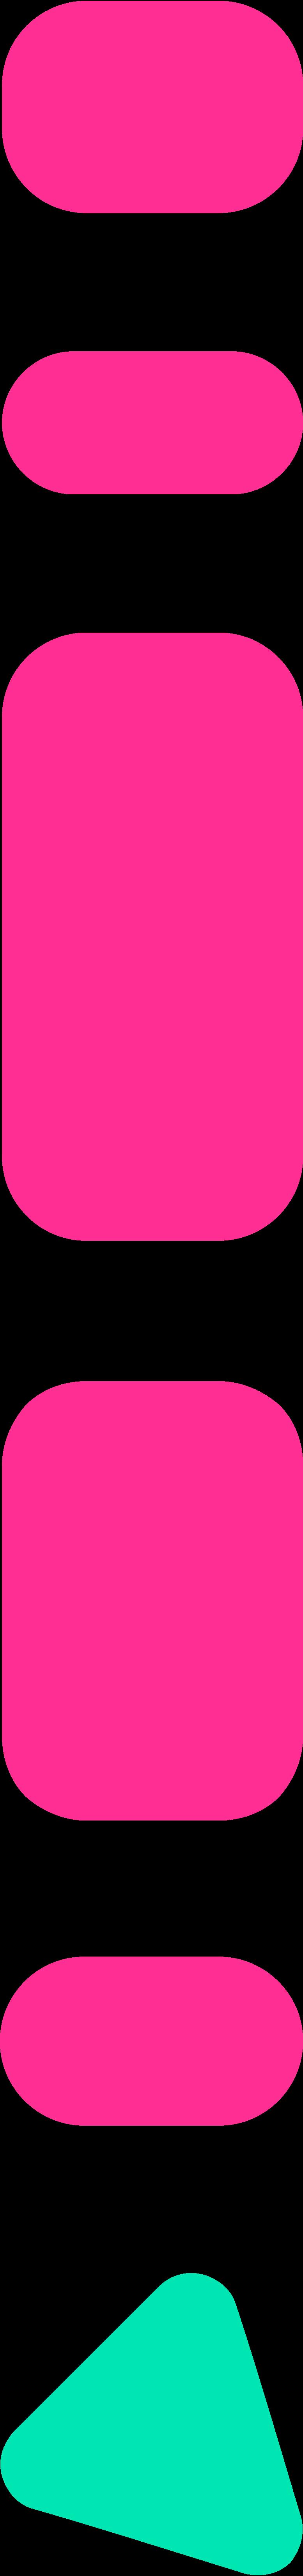 figure Clipart illustration in PNG, SVG